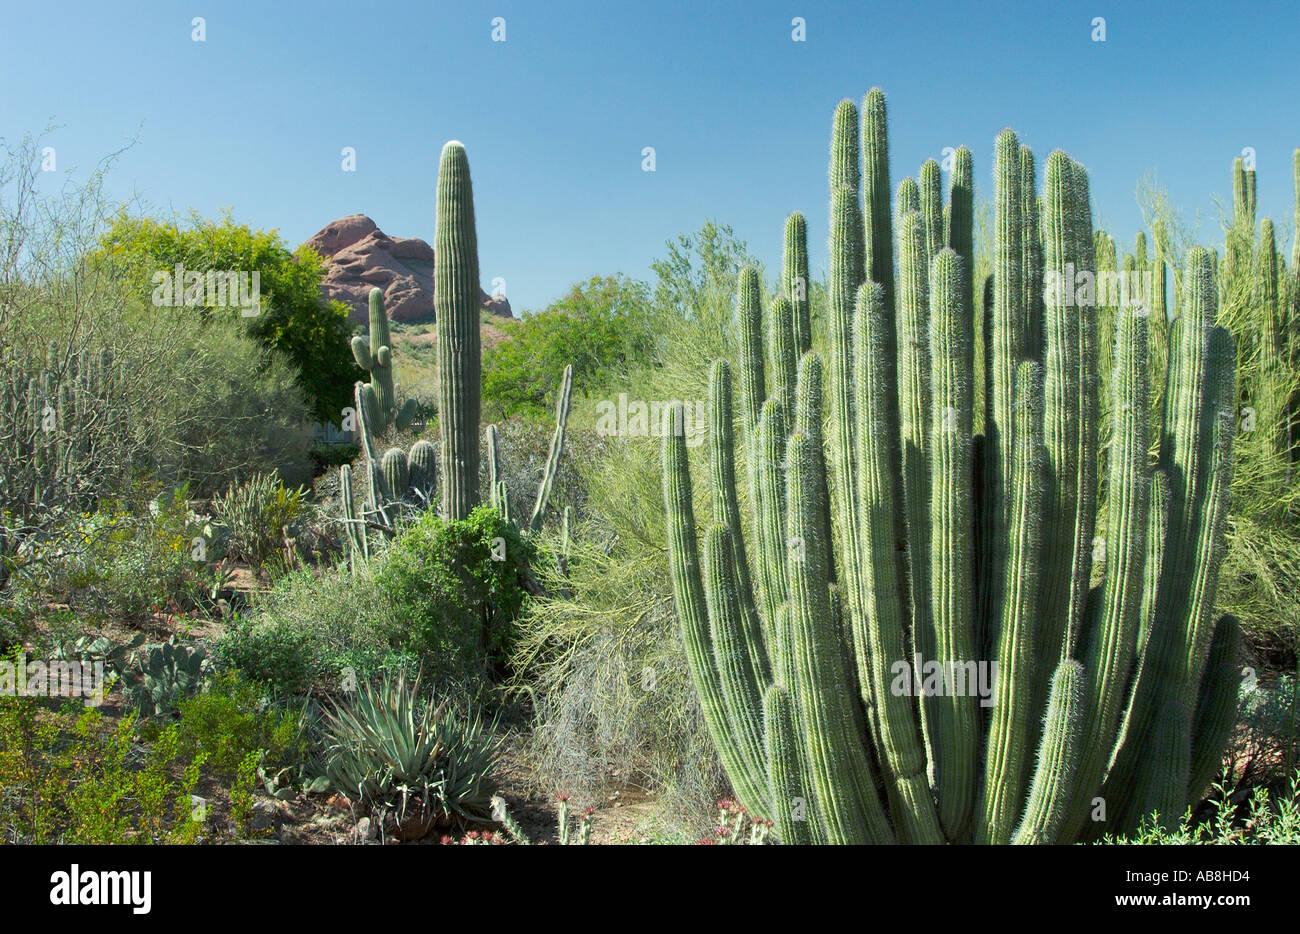 Cactus Garden Landscape In The Desert Botanical Gardens In Phoenix Arizona  USA